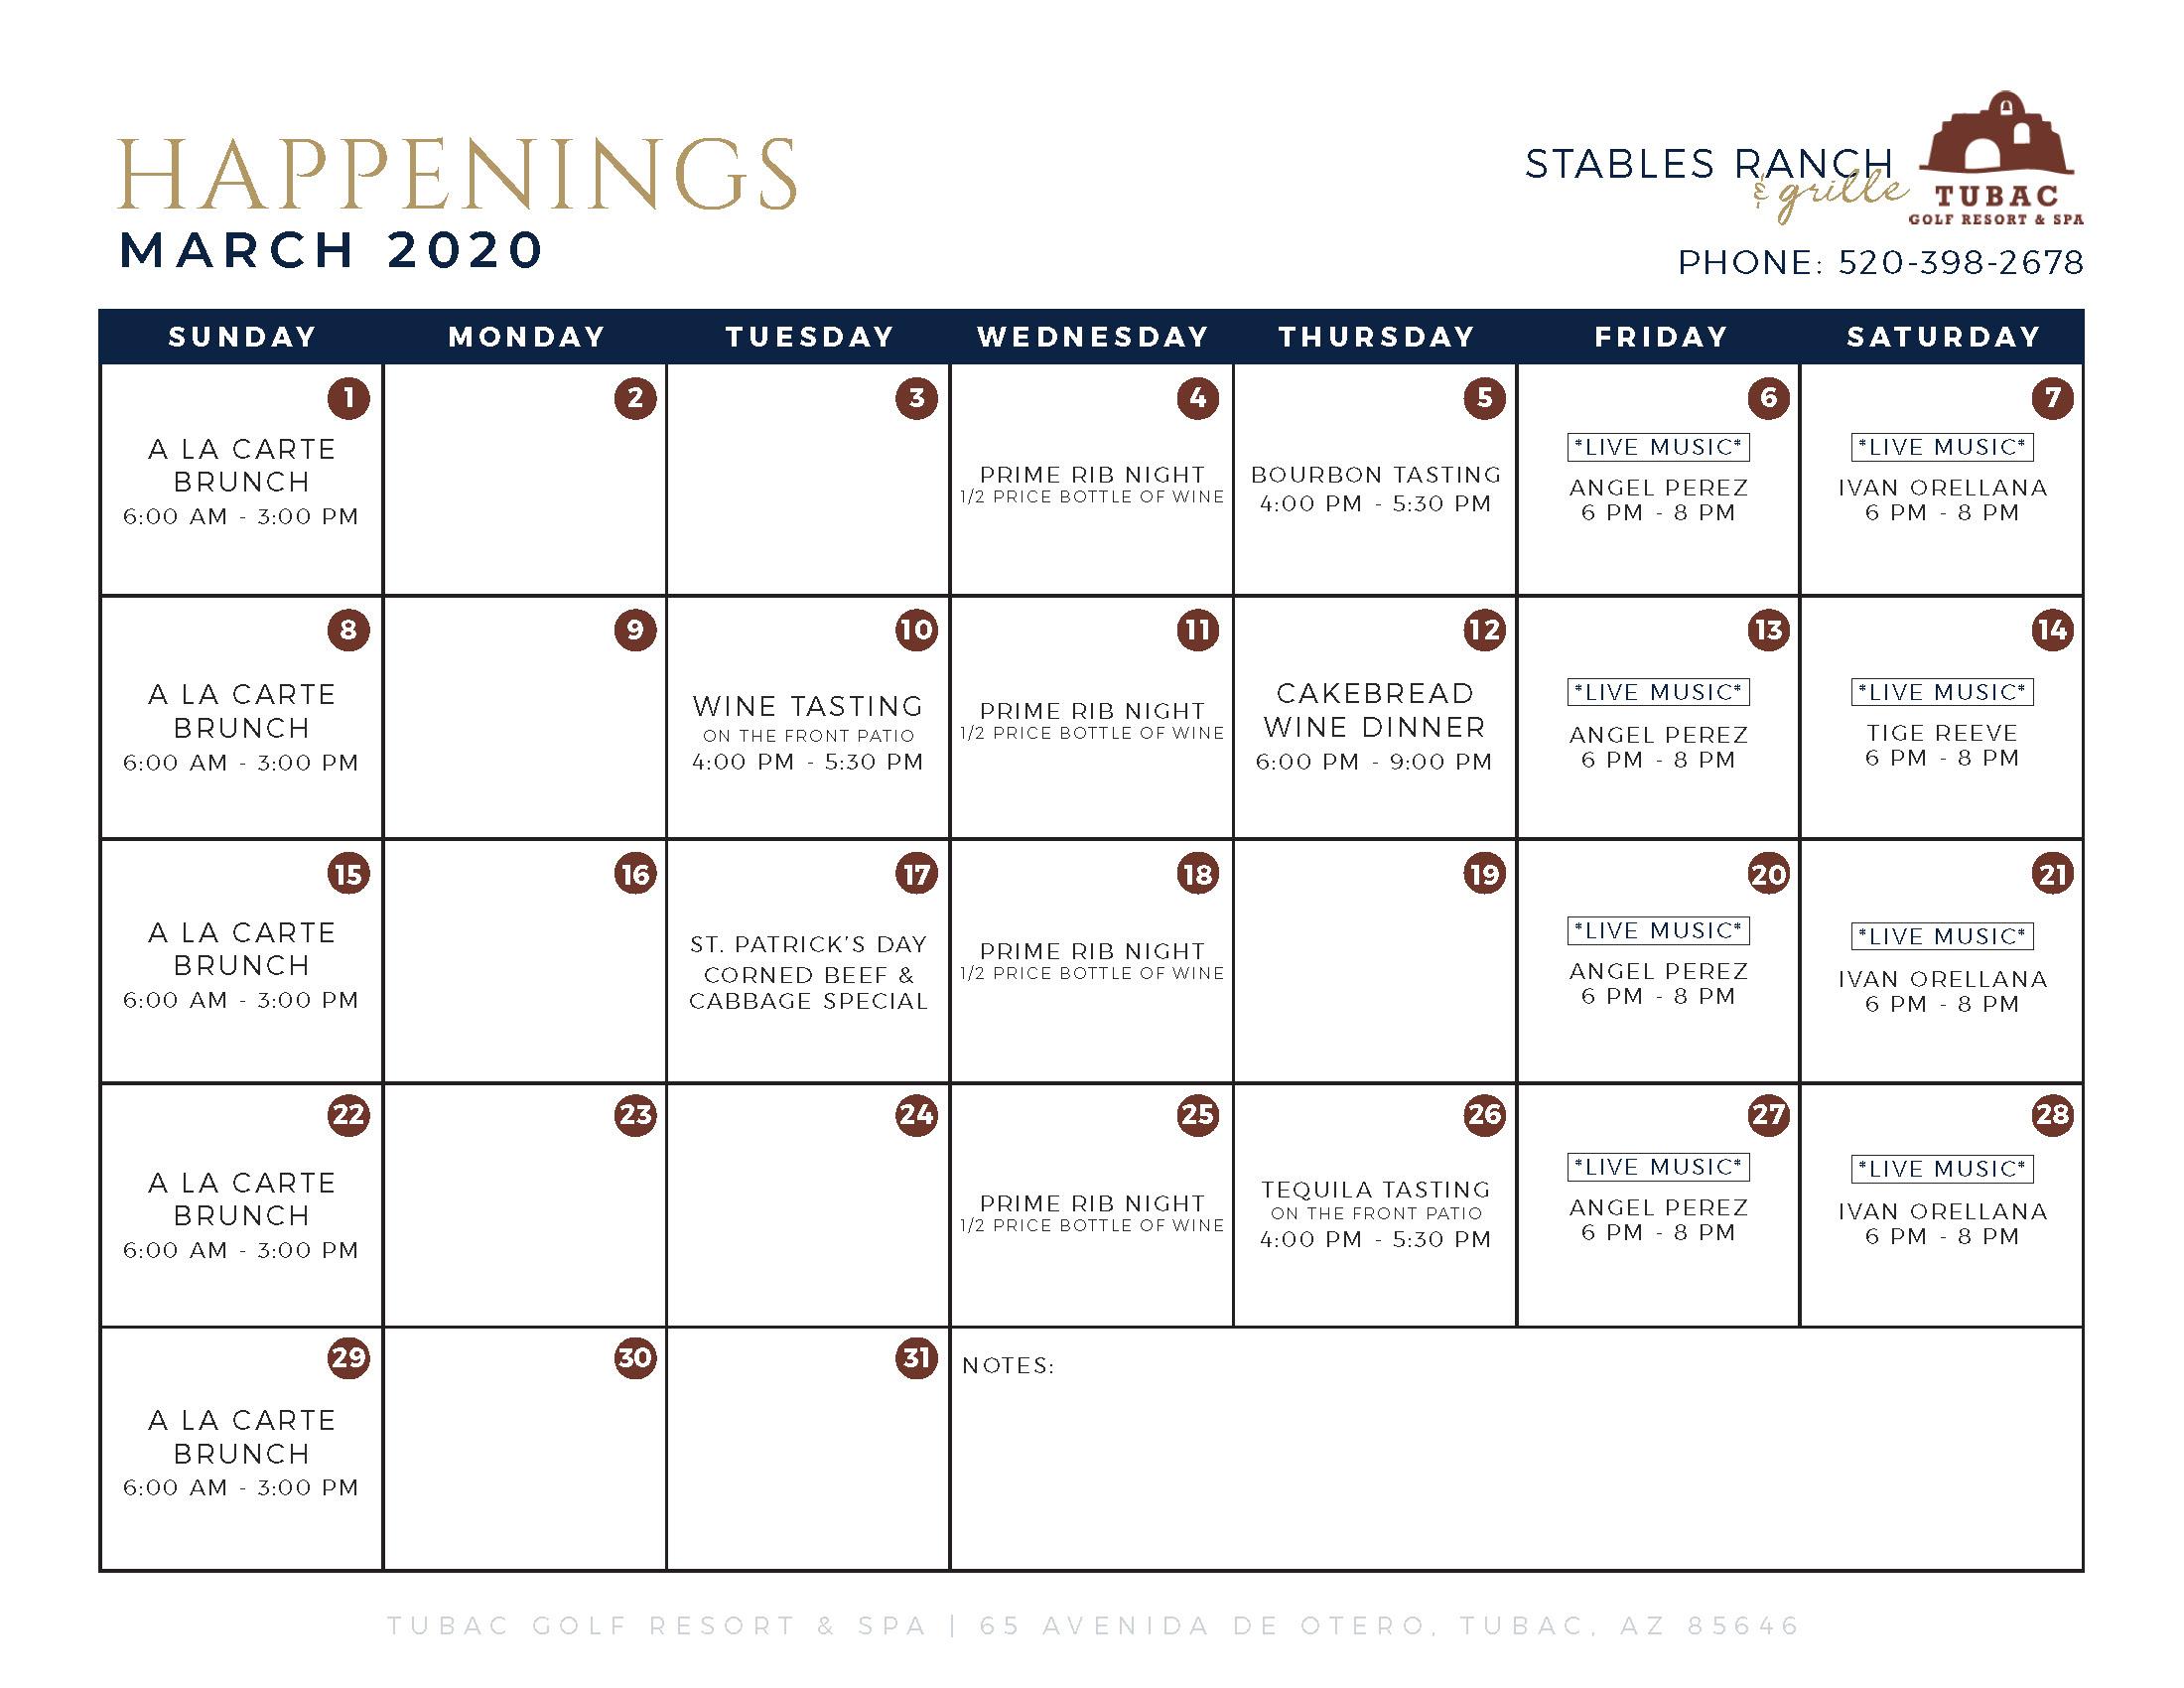 Monthly Calendar - March 2020 [Edited] - Tubac Golf Resort & Spa